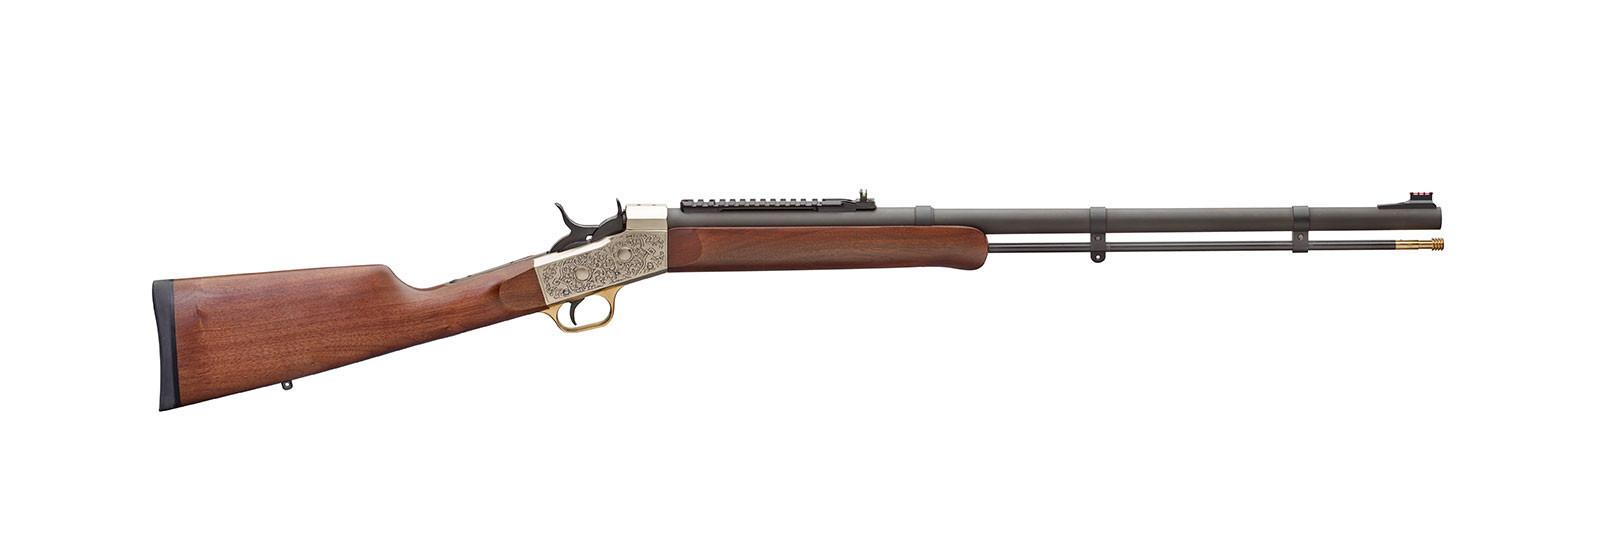 Rolling block musket .50 209 + konus scope